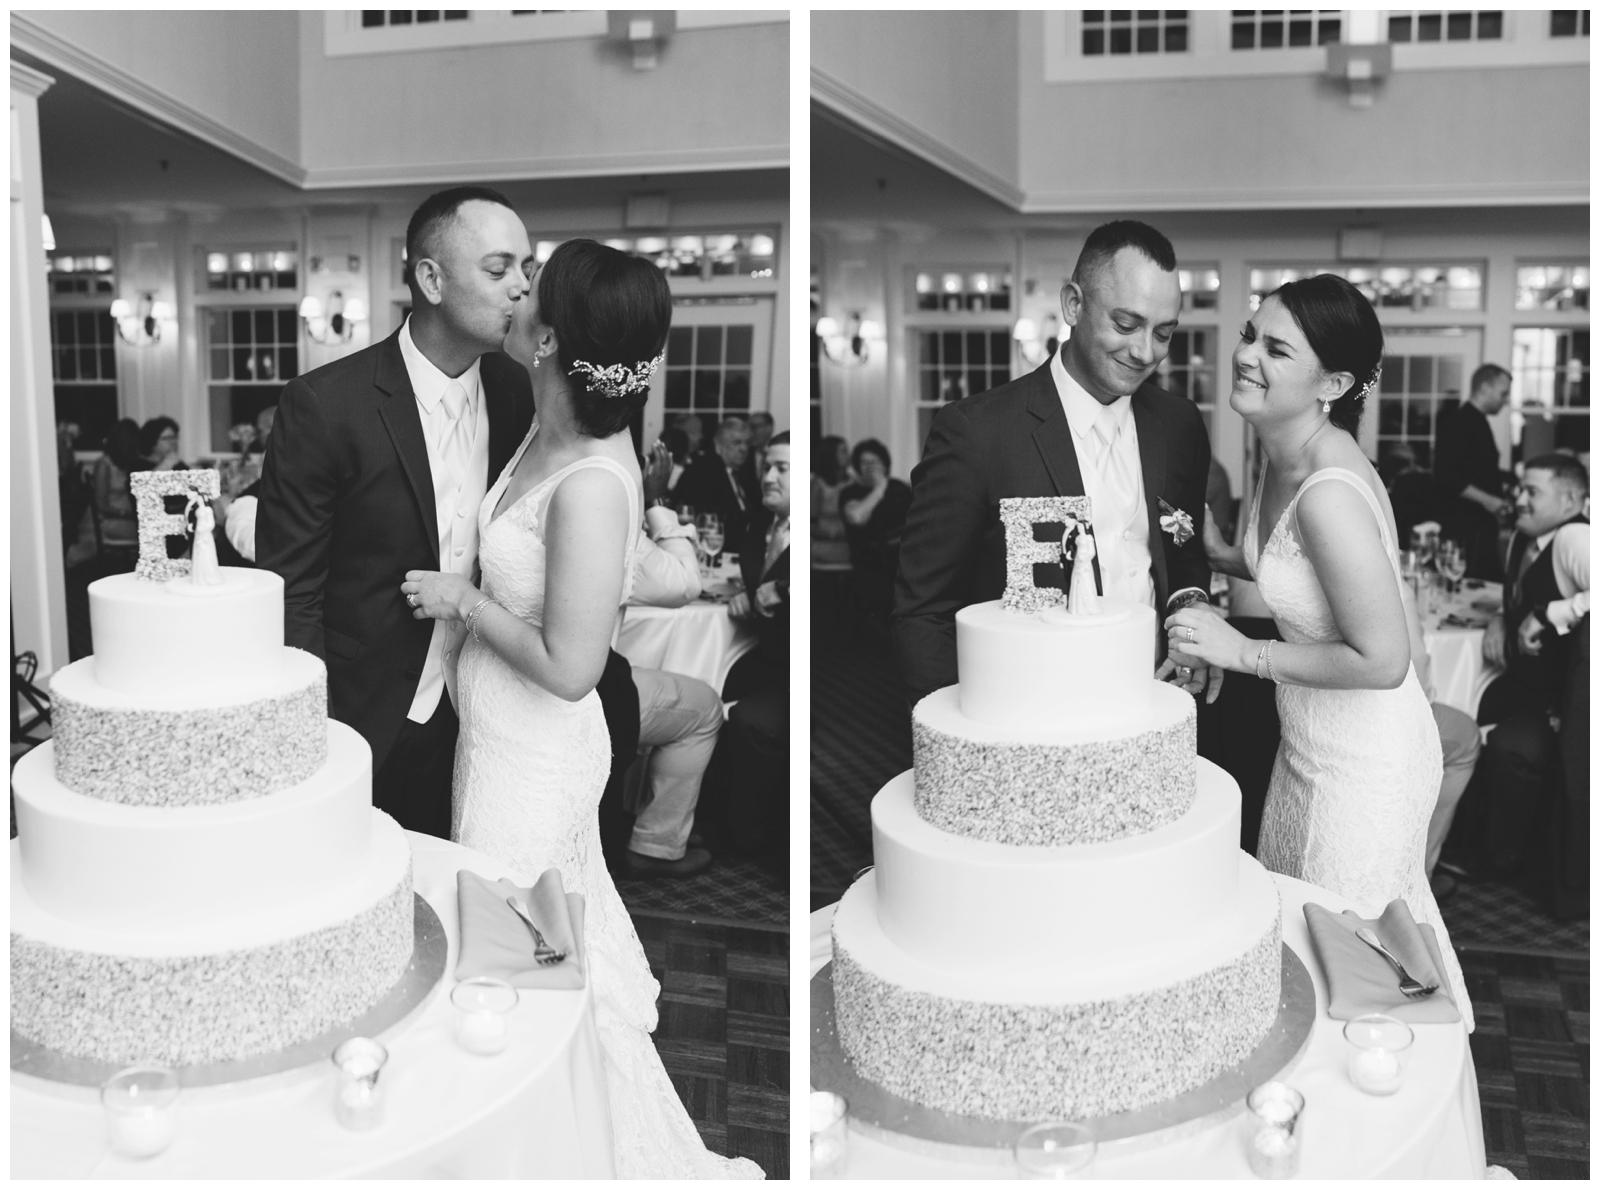 Bailey-Q-Photo-Pine-Hills-Pavilion-Wedding-Boston-Wedding-Photographer-103.jpg